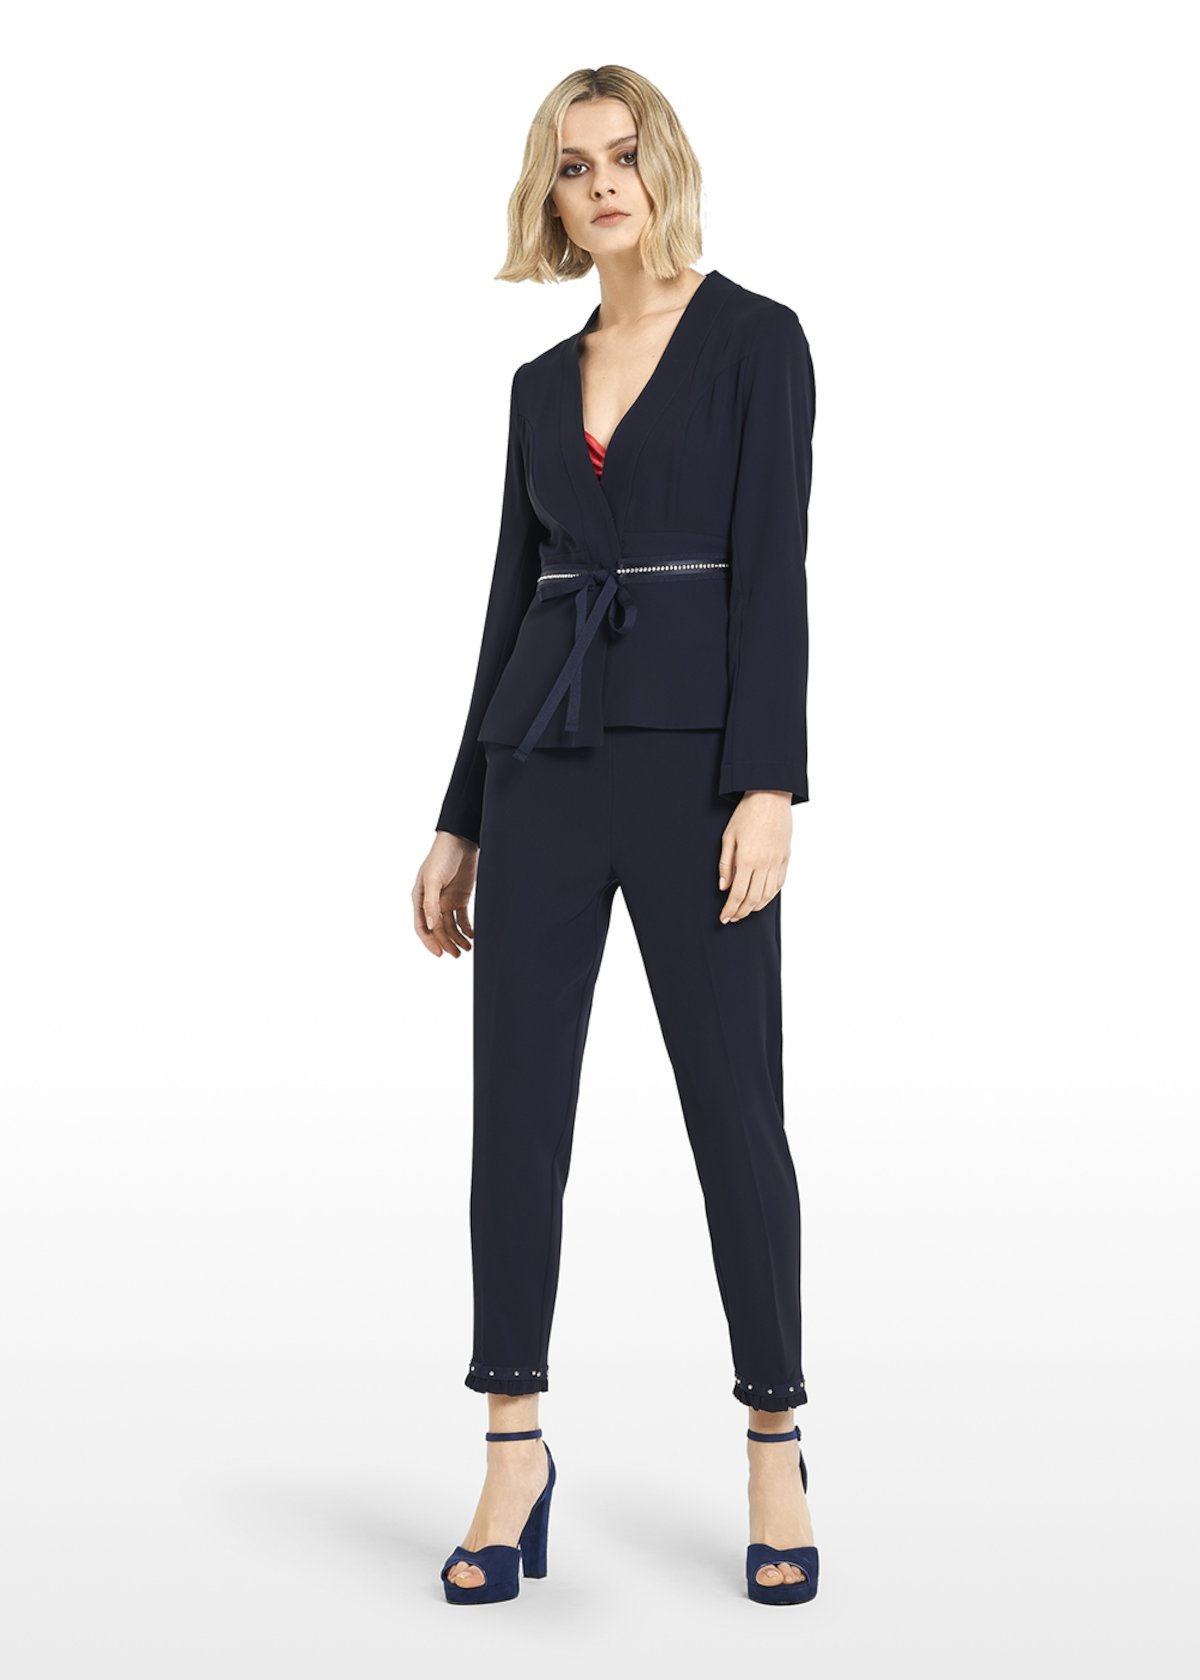 Gilda jacket cadi fabric with removable belt